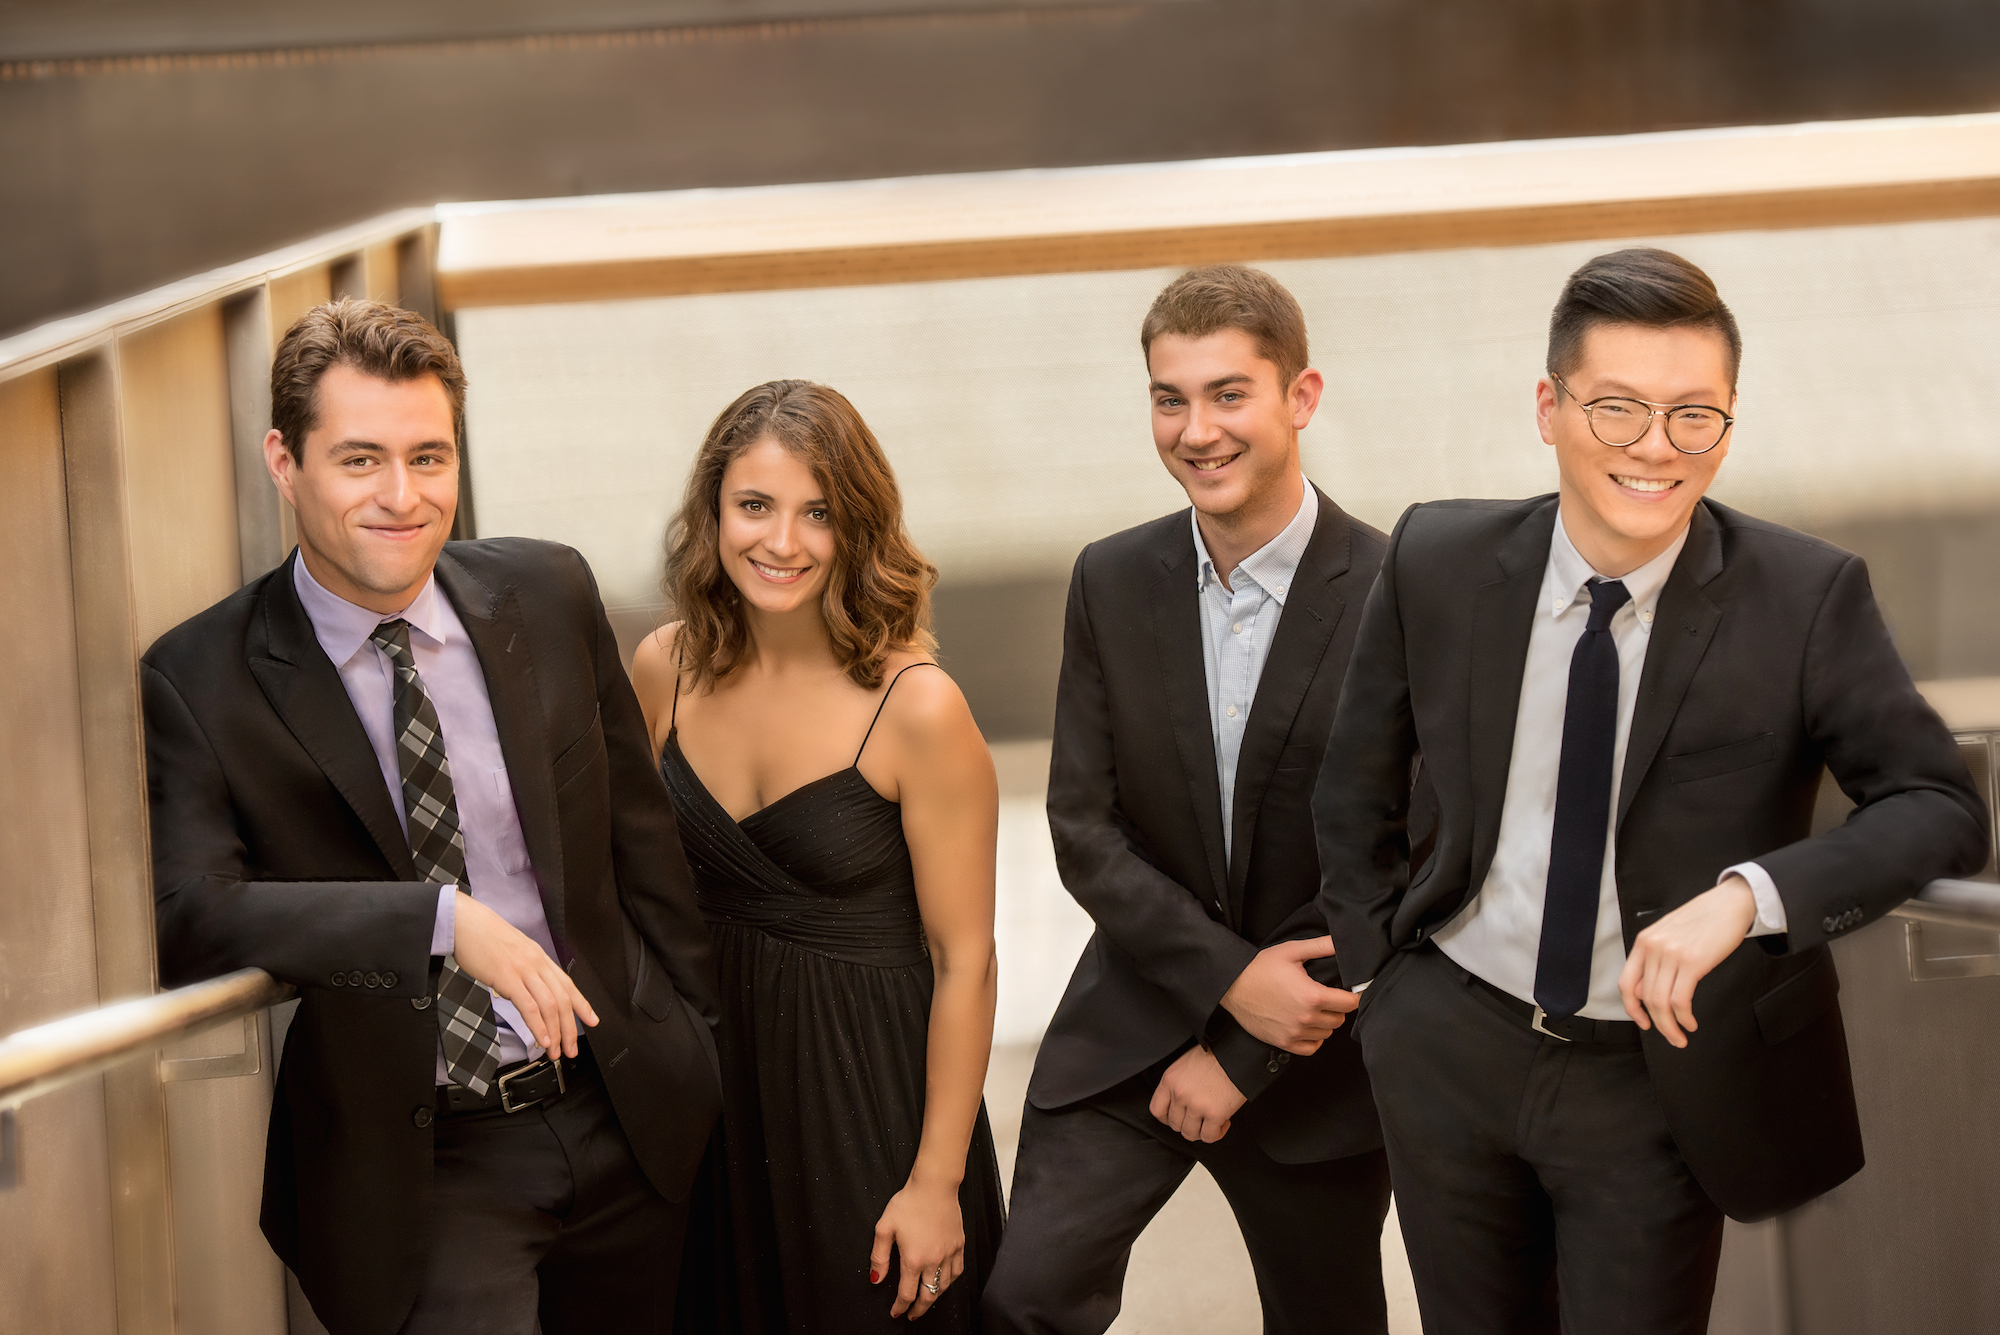 Dover+Quartet+3+credit+Carlin+Ma.jpg